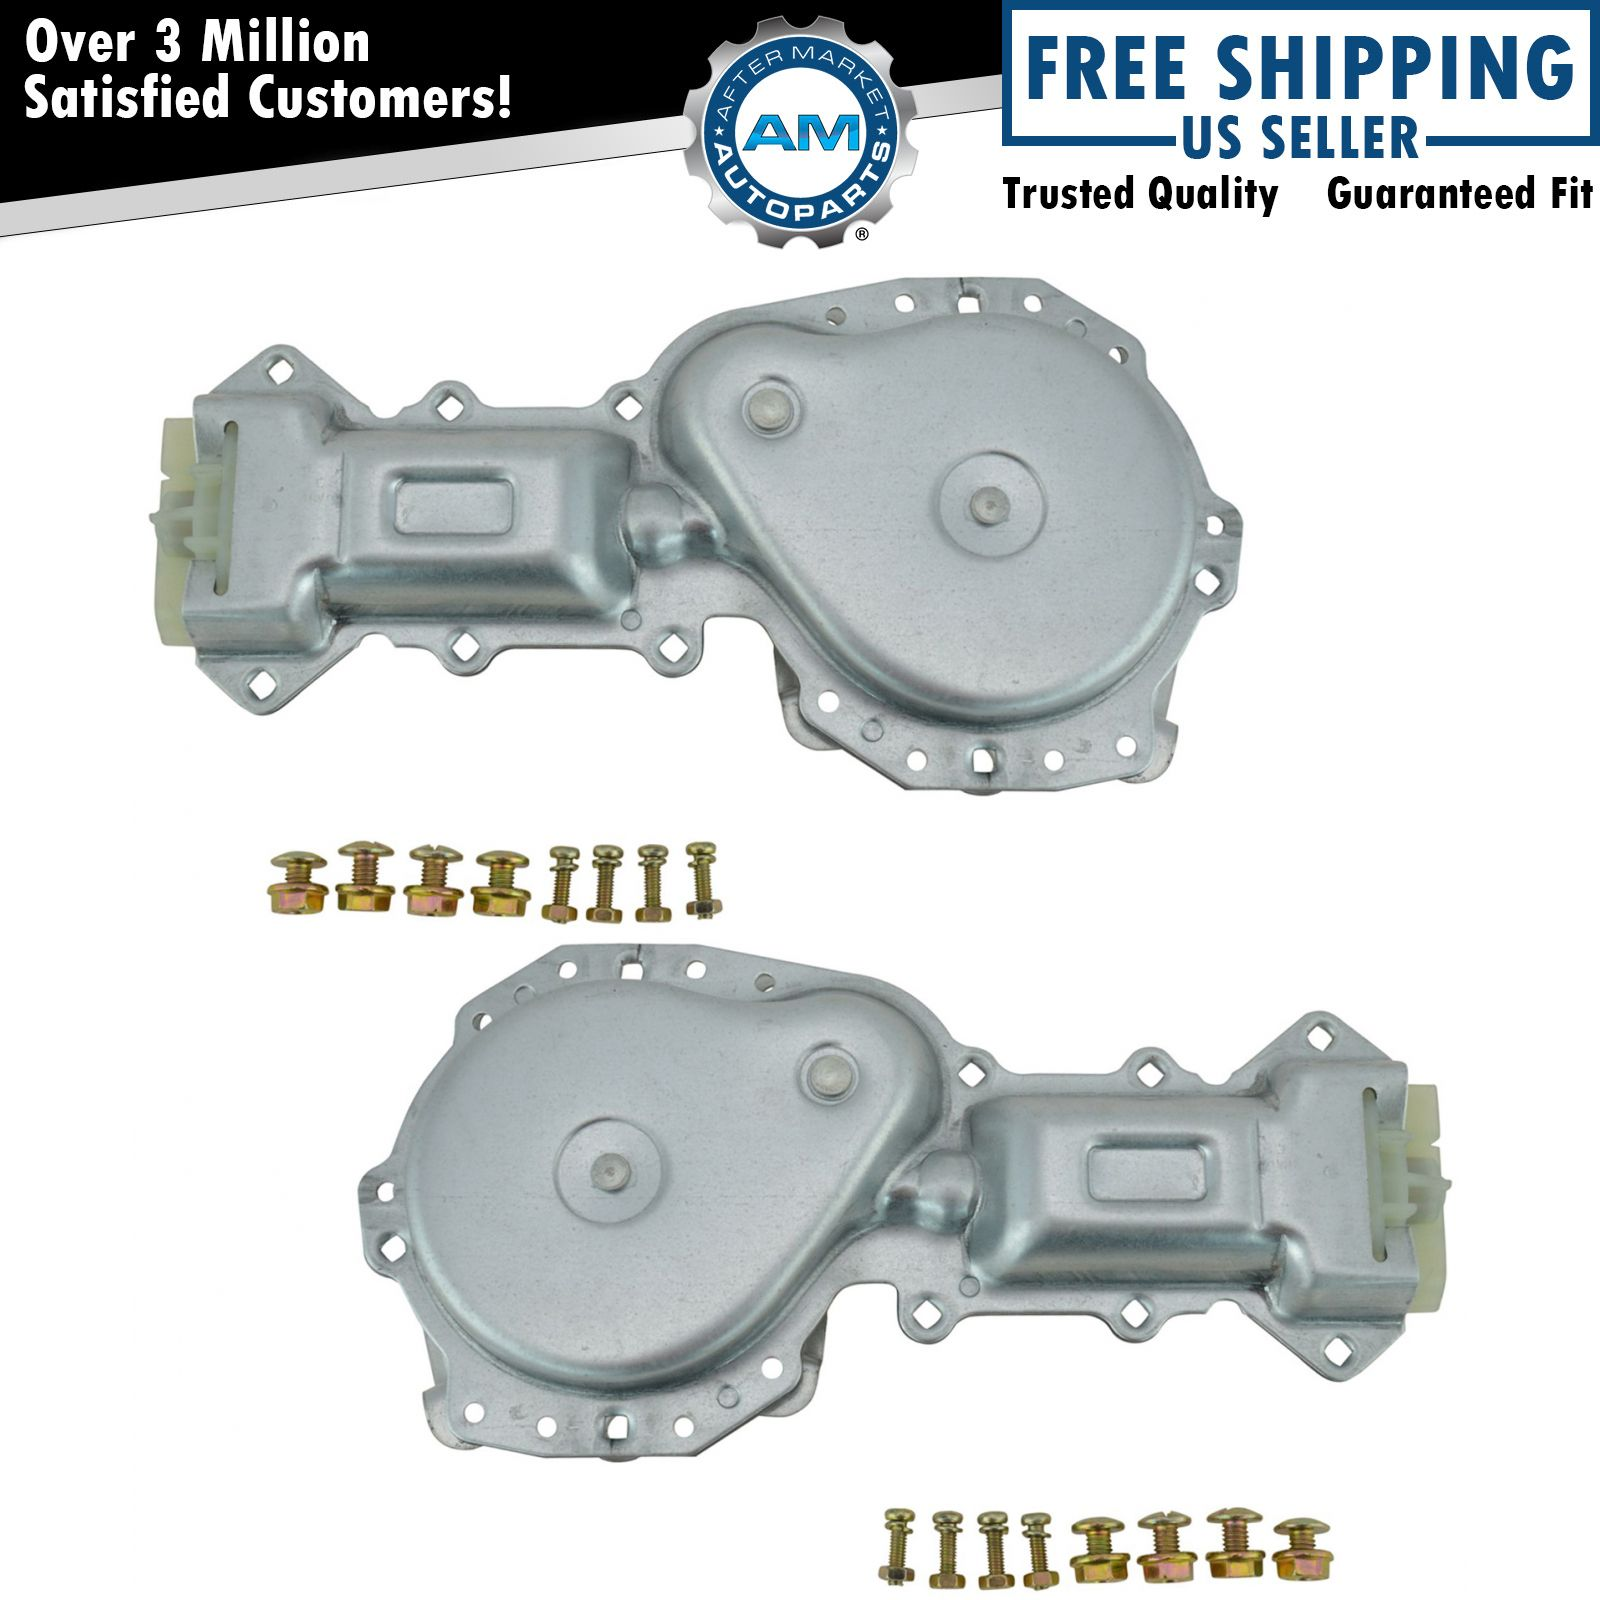 A-Premium Power Window Lift Motor For Chevrolet Blazer Camaro Caprice Cavalier GMC Cadillac Buick Oldsmobile Pontiac Driver or Passenger Side